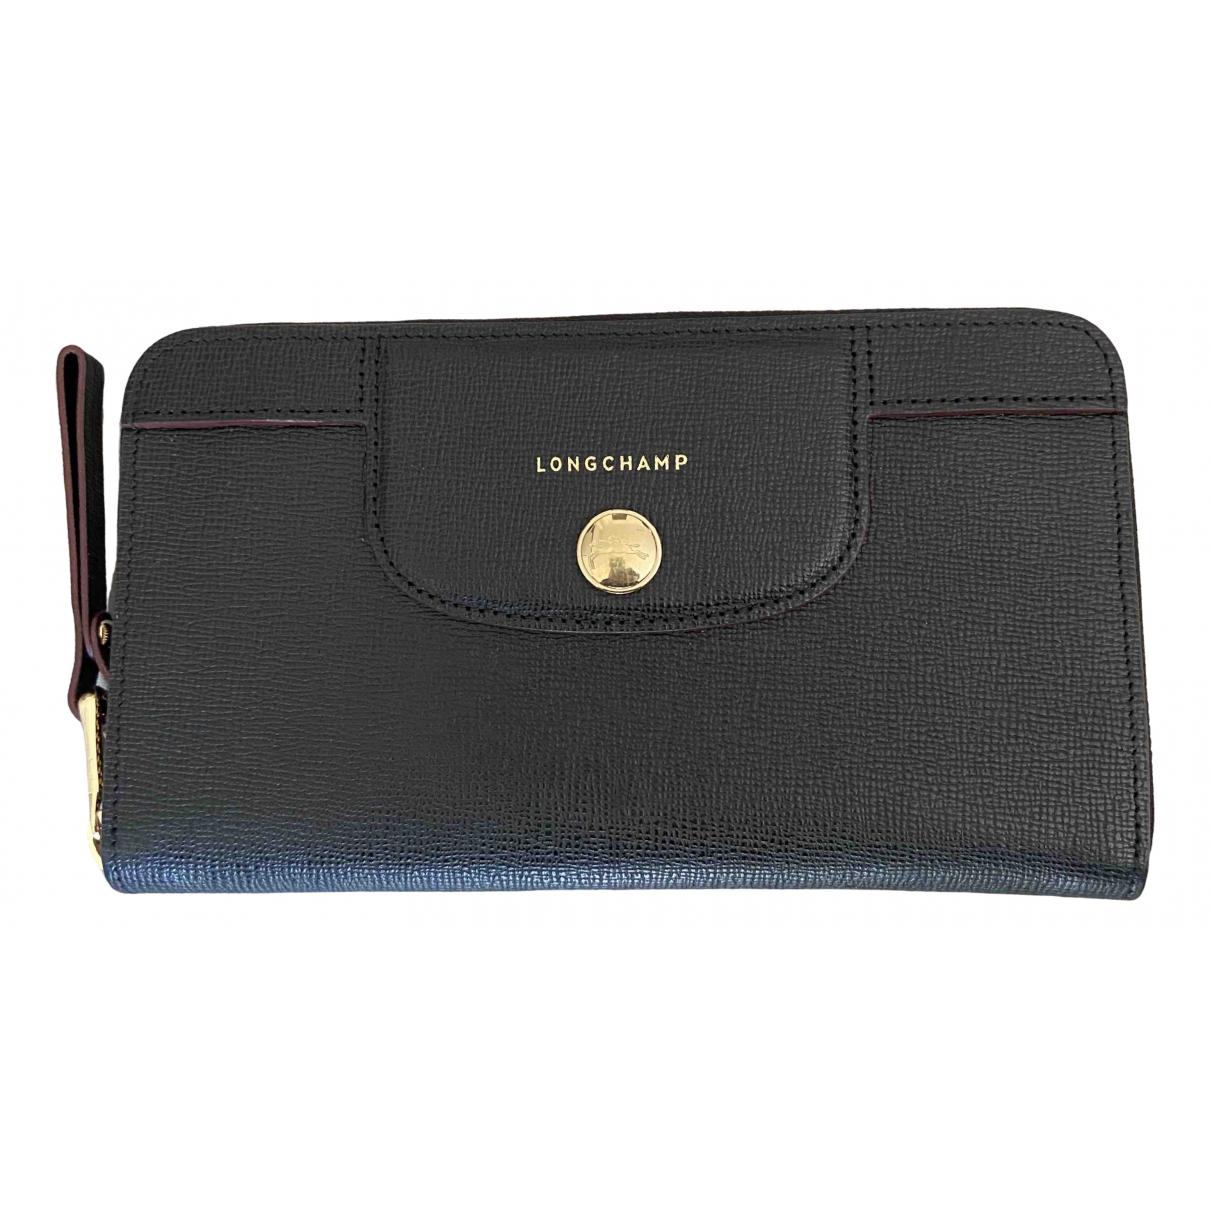 Longchamp \N Black Leather wallet for Women \N